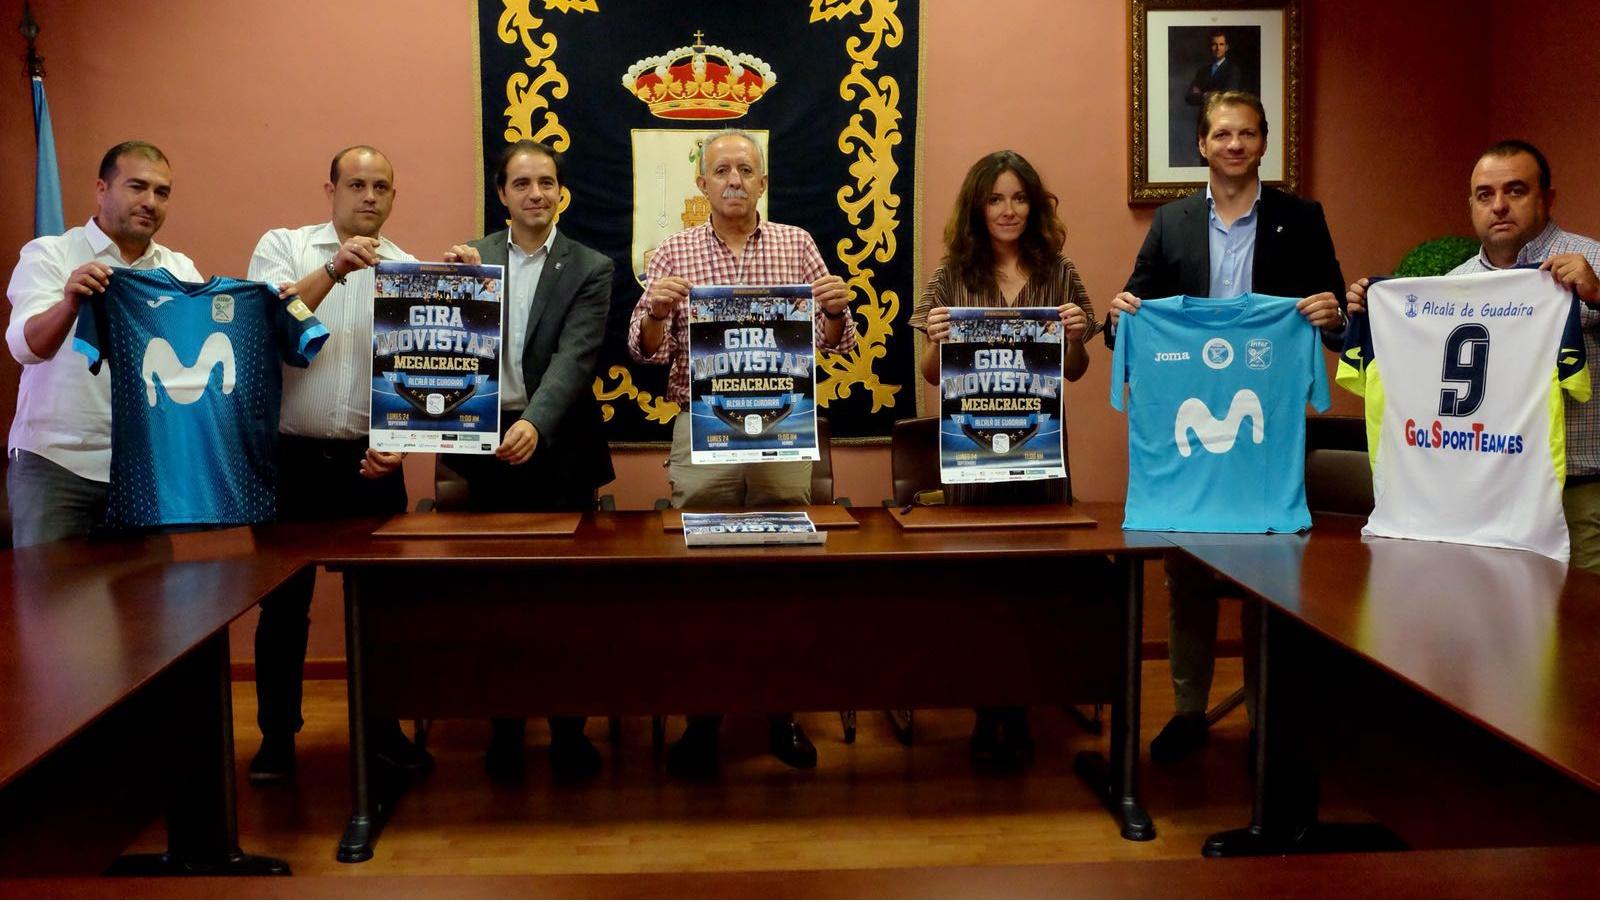 La Gira Movistar Megacracks hará parada en Alcalá de Guadaíra